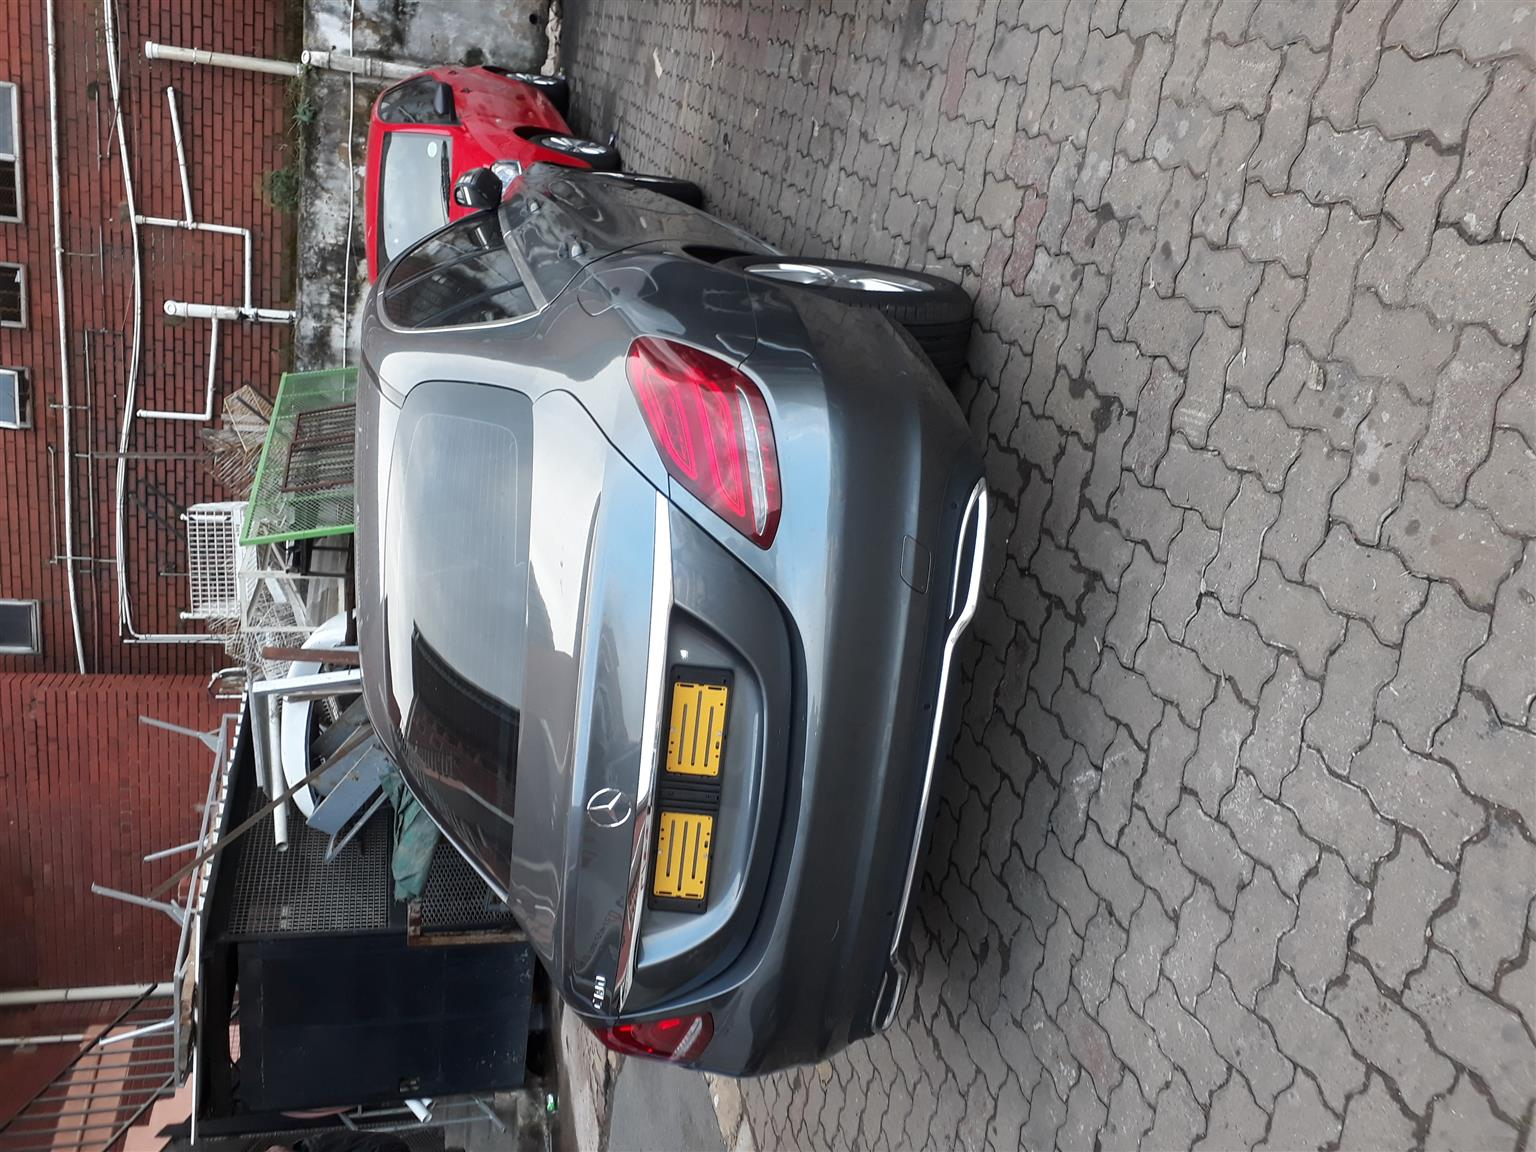 2016 Mercedes Benz C-Class C180 Edition C